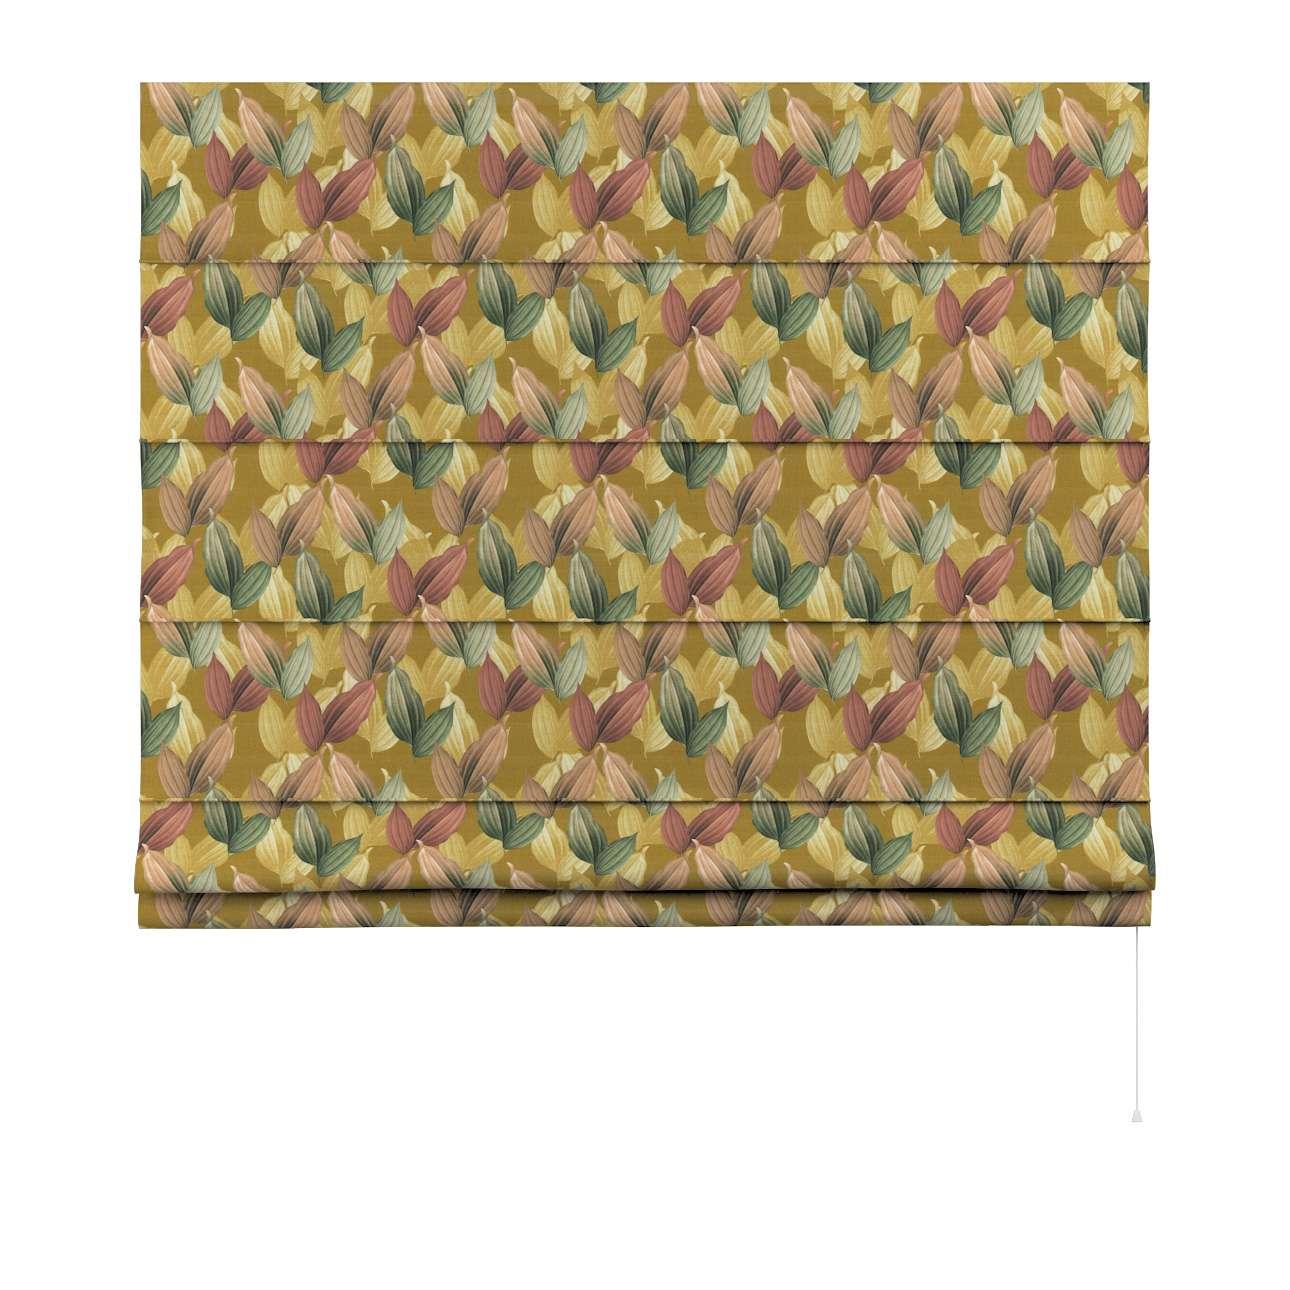 Capri roman blind in collection Abigail, fabric: 143-22